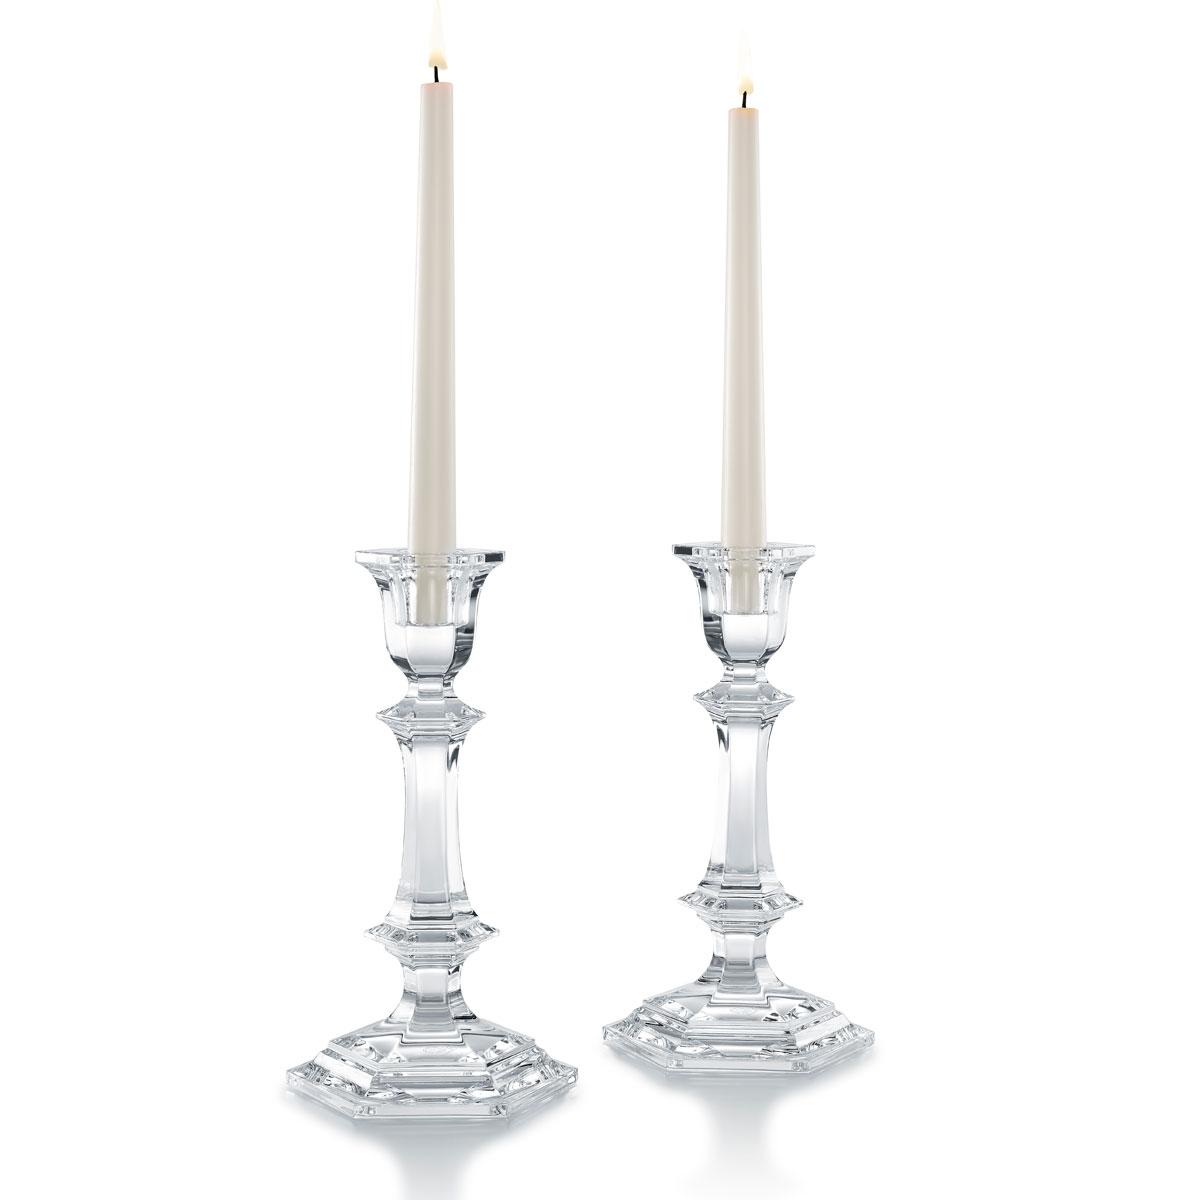 "Baccarat Harcourt 9"" Candlesticks, Pair"